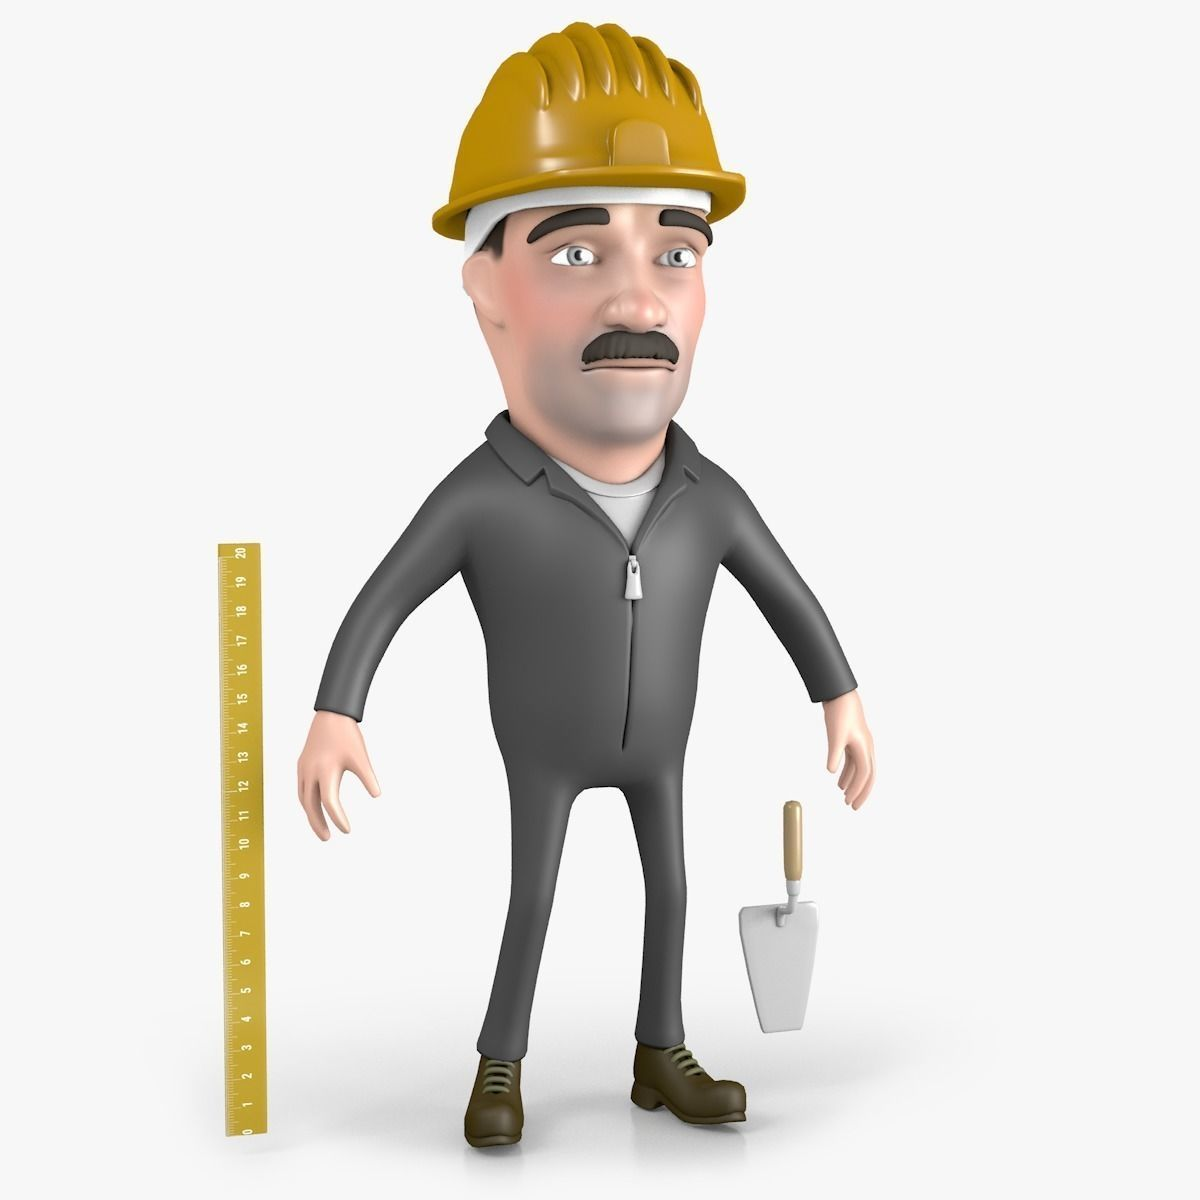 Builder cartoon character 3d model cartoon characters